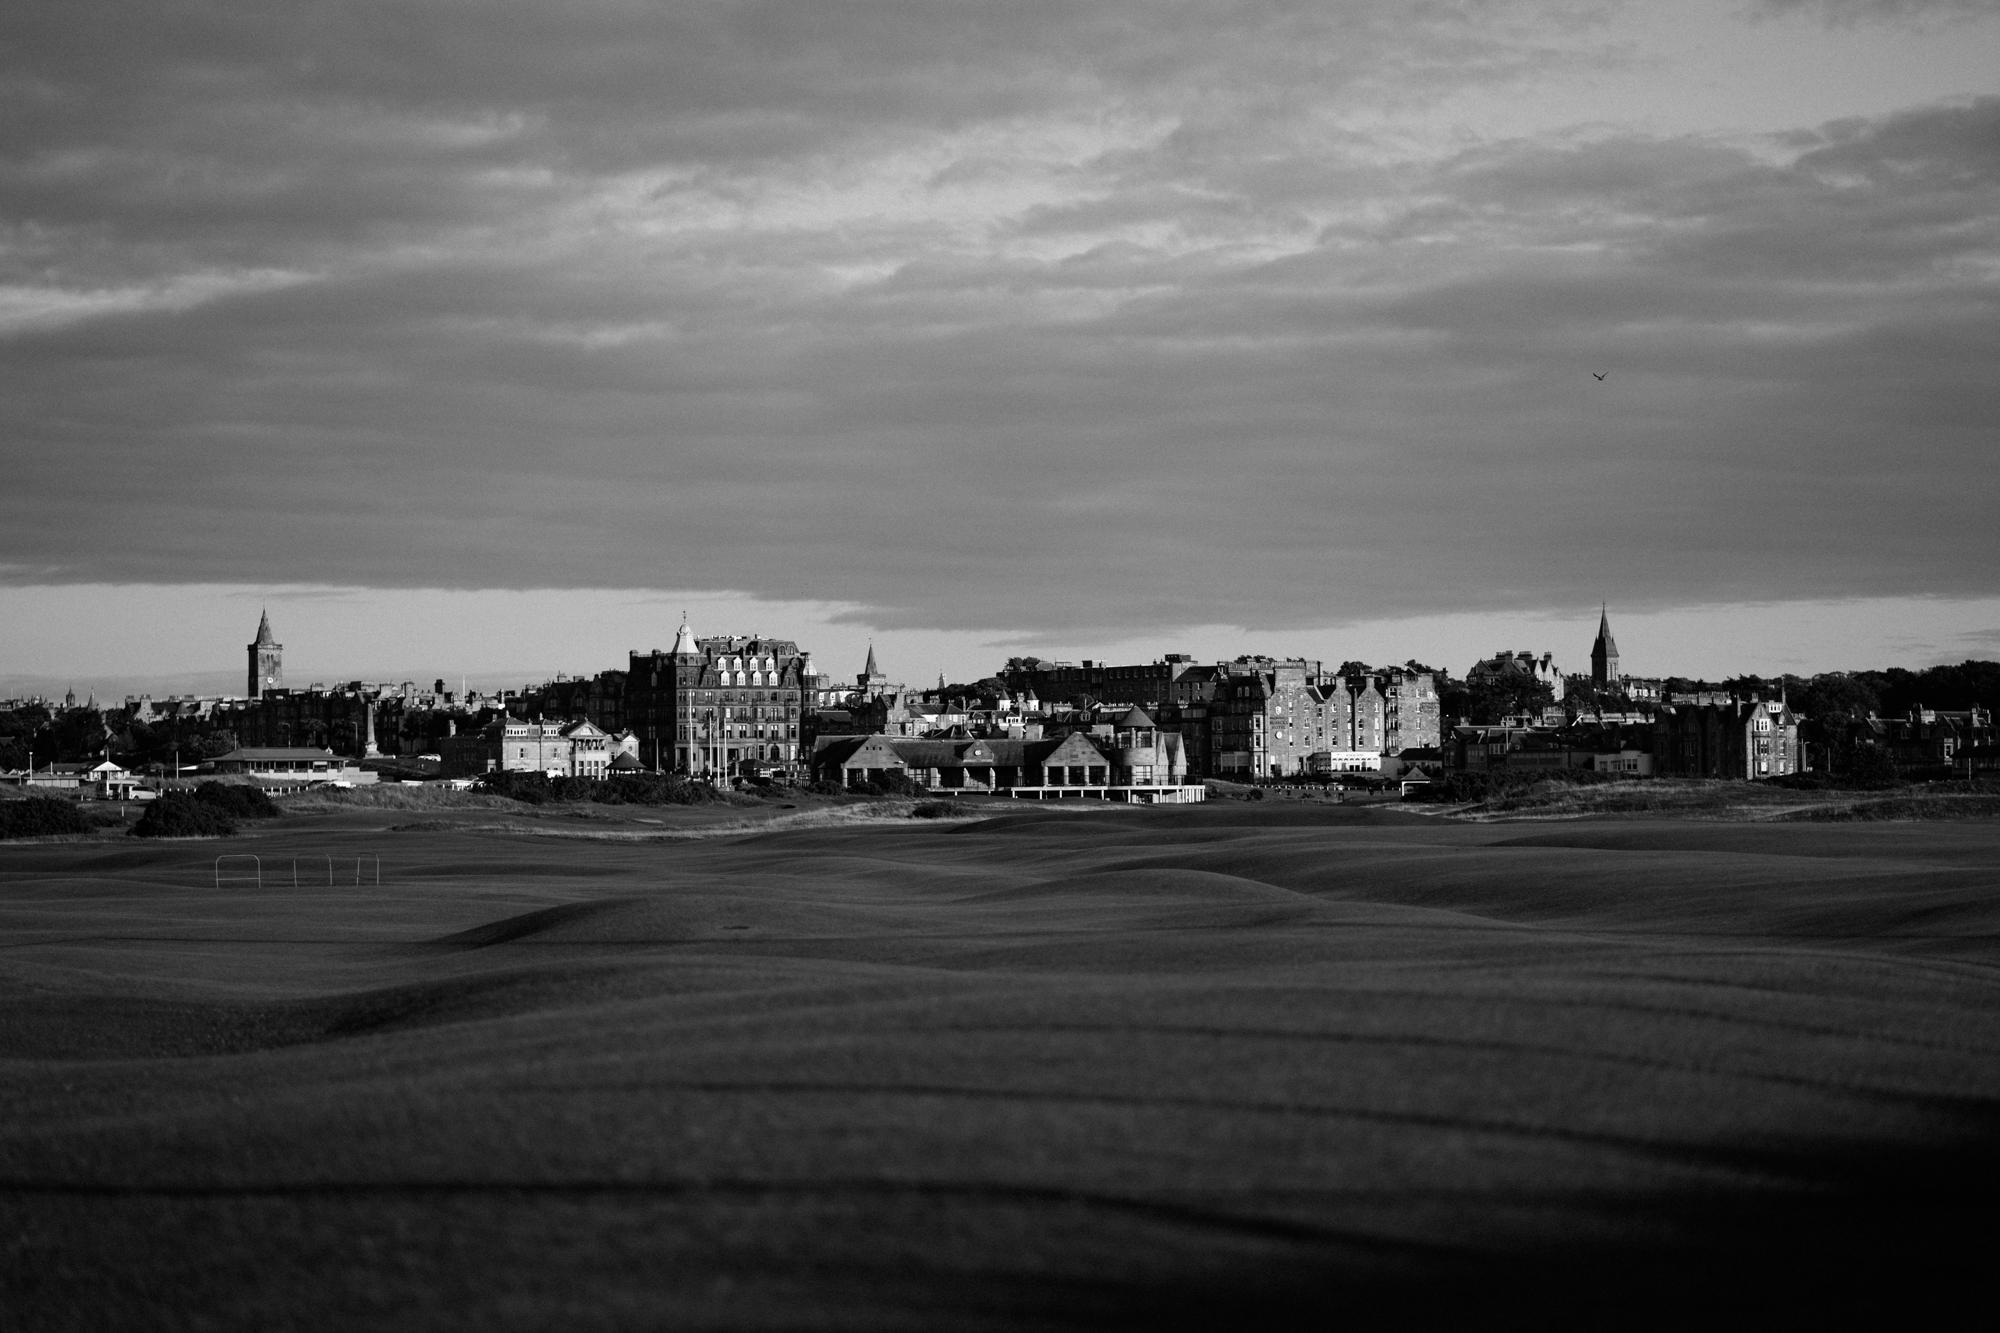 Scotland_OldCourse-02381.jpg